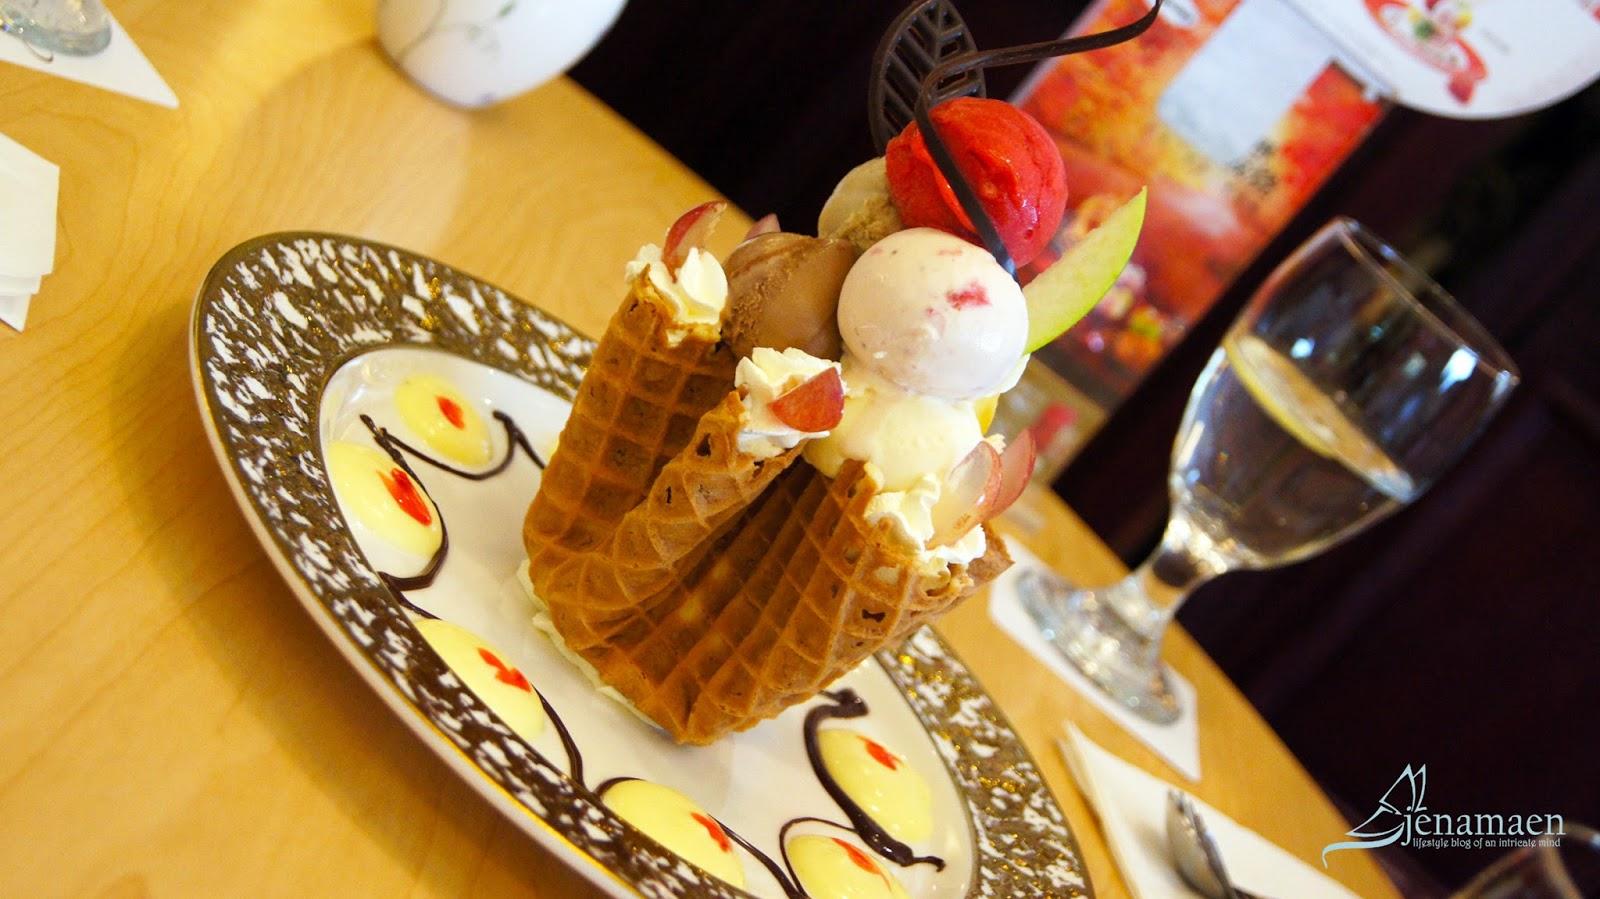 Haagen-Dazs's Beautiful Dessert Creations, in Shanghai China